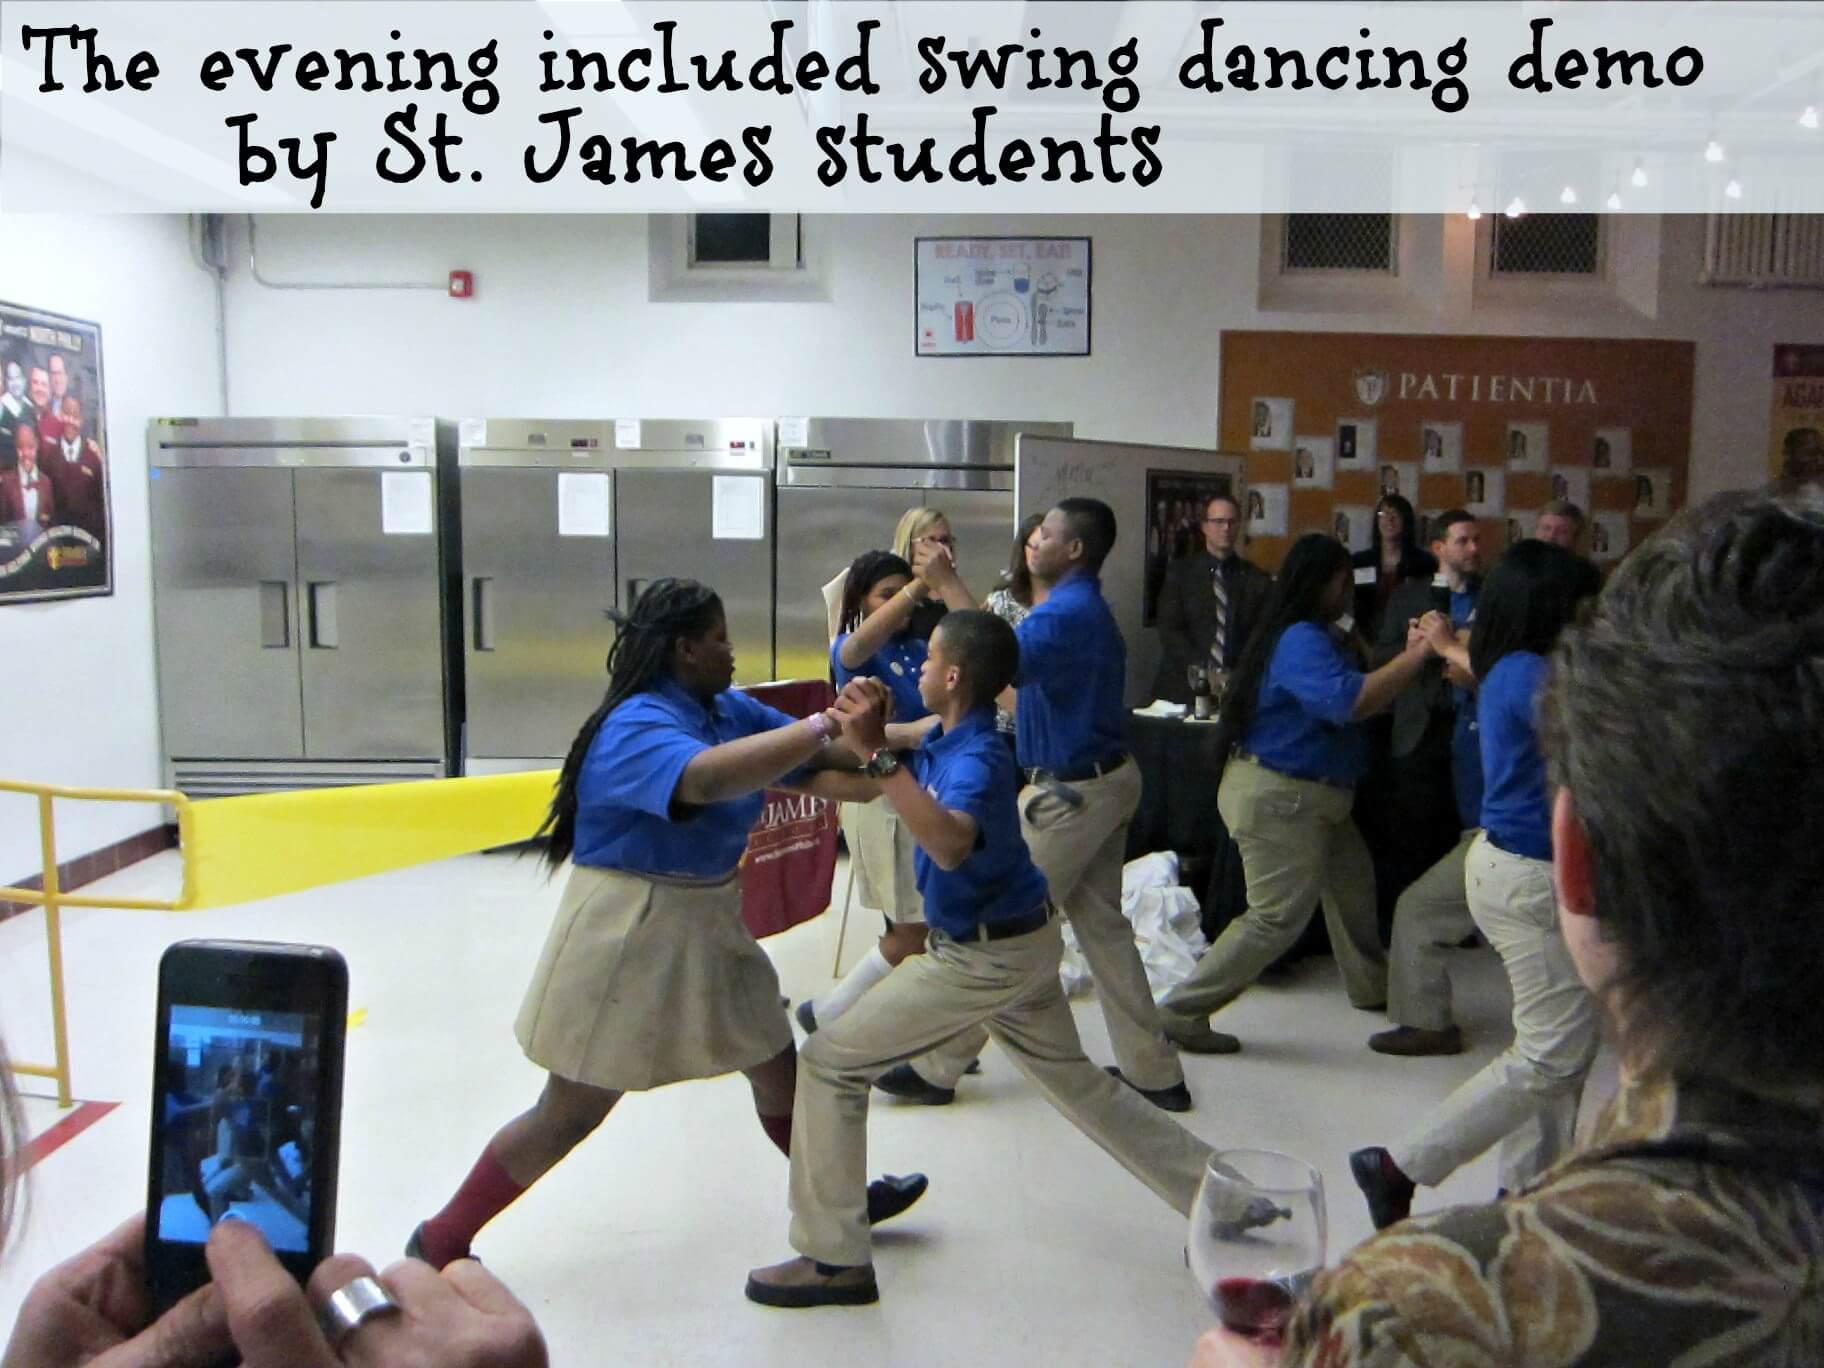 East Falls Local St James Neighborhood Kitchen 2-11 swing dancing kids text